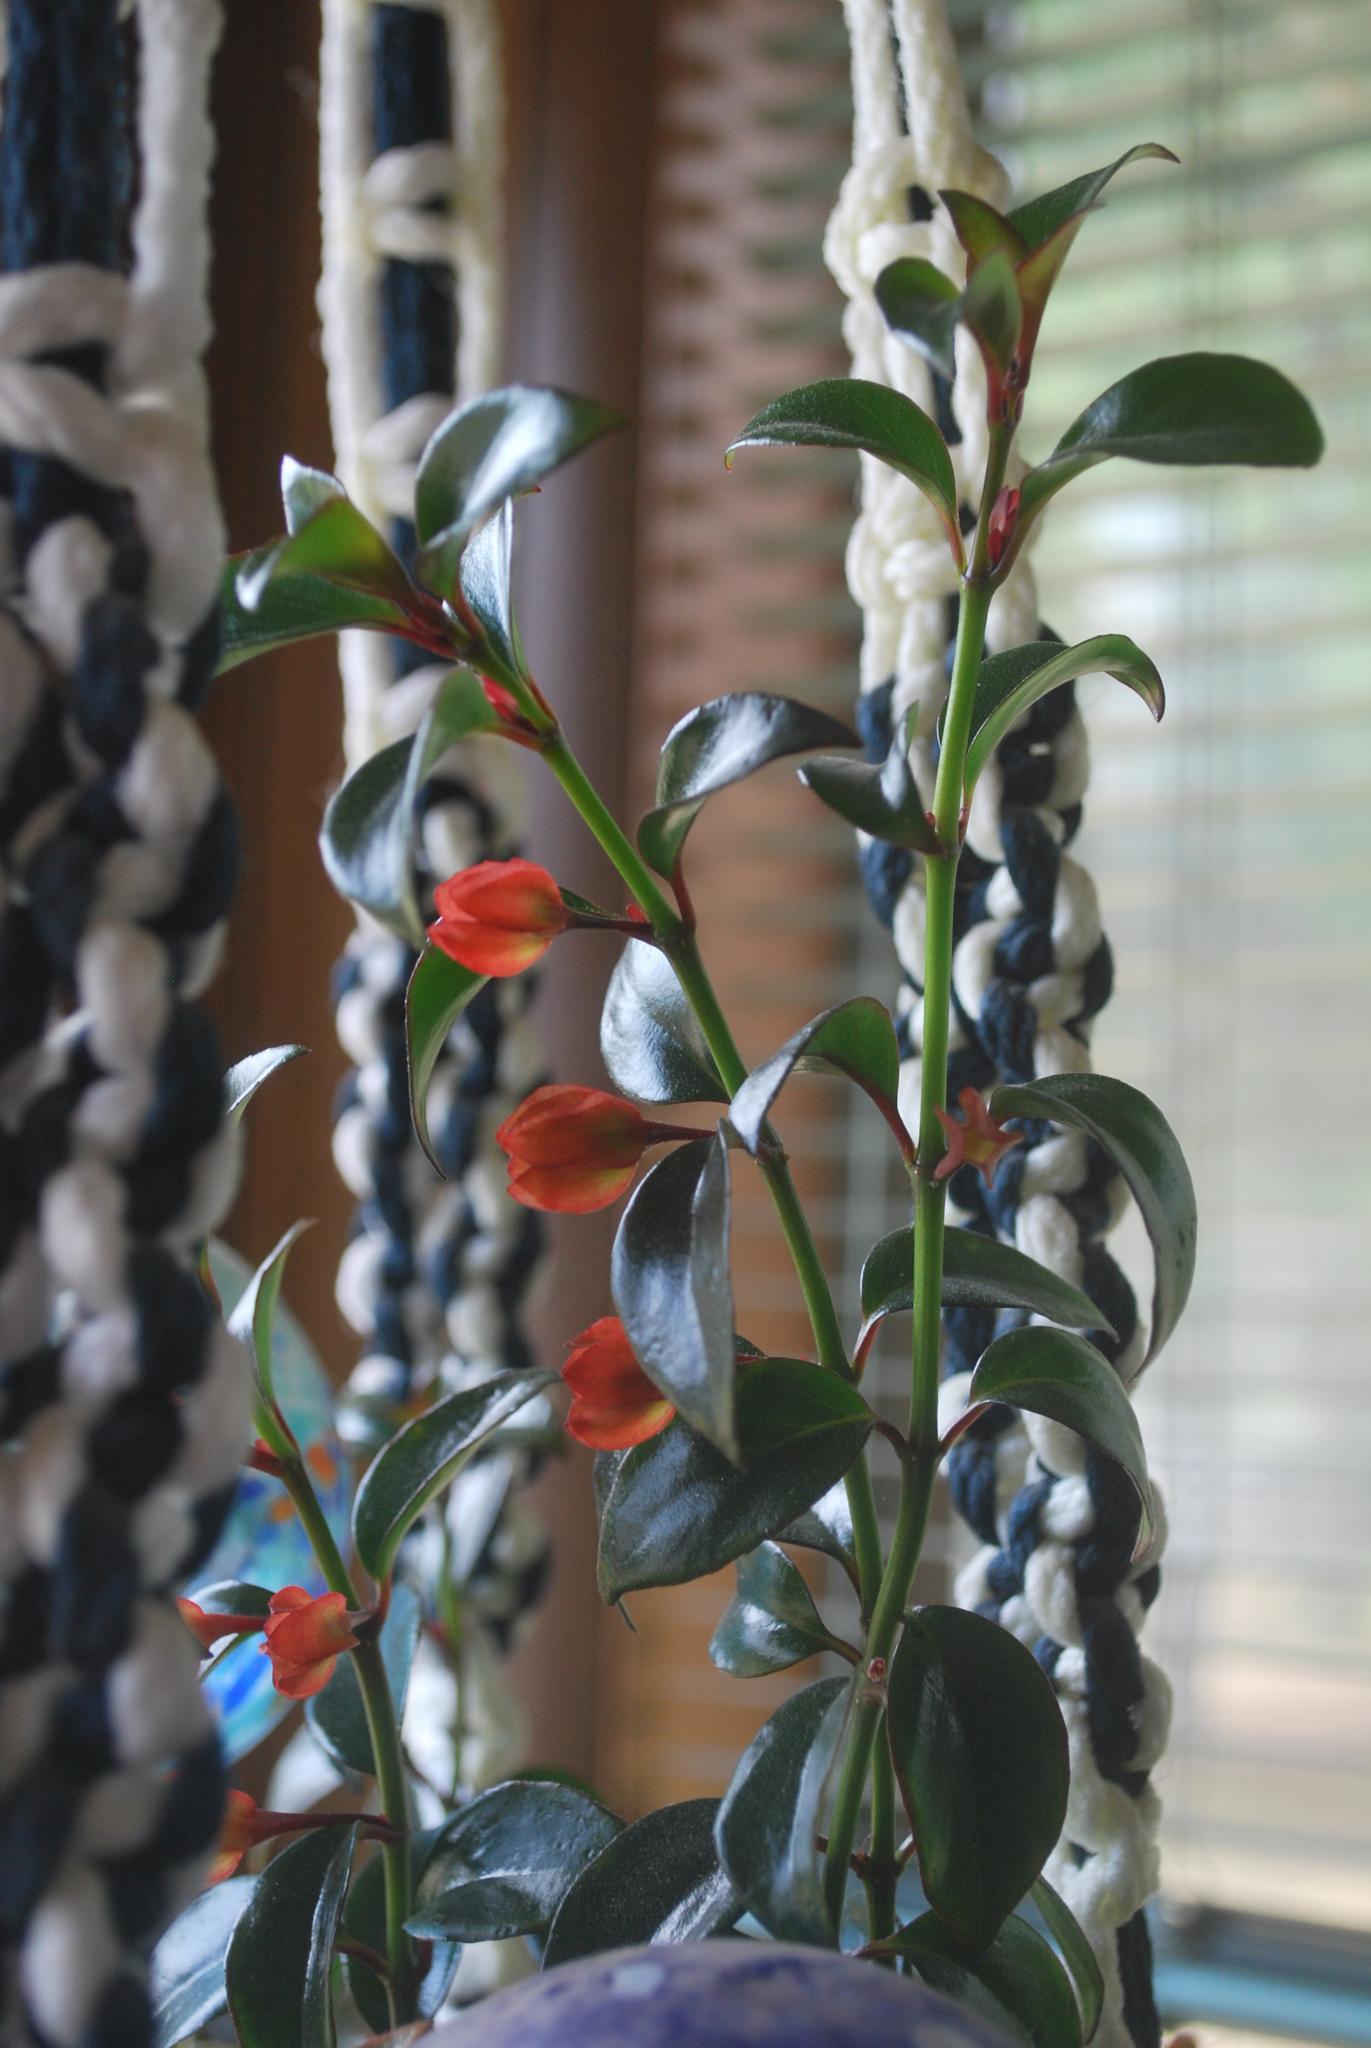 Lipstick plant by marilyn wirtz